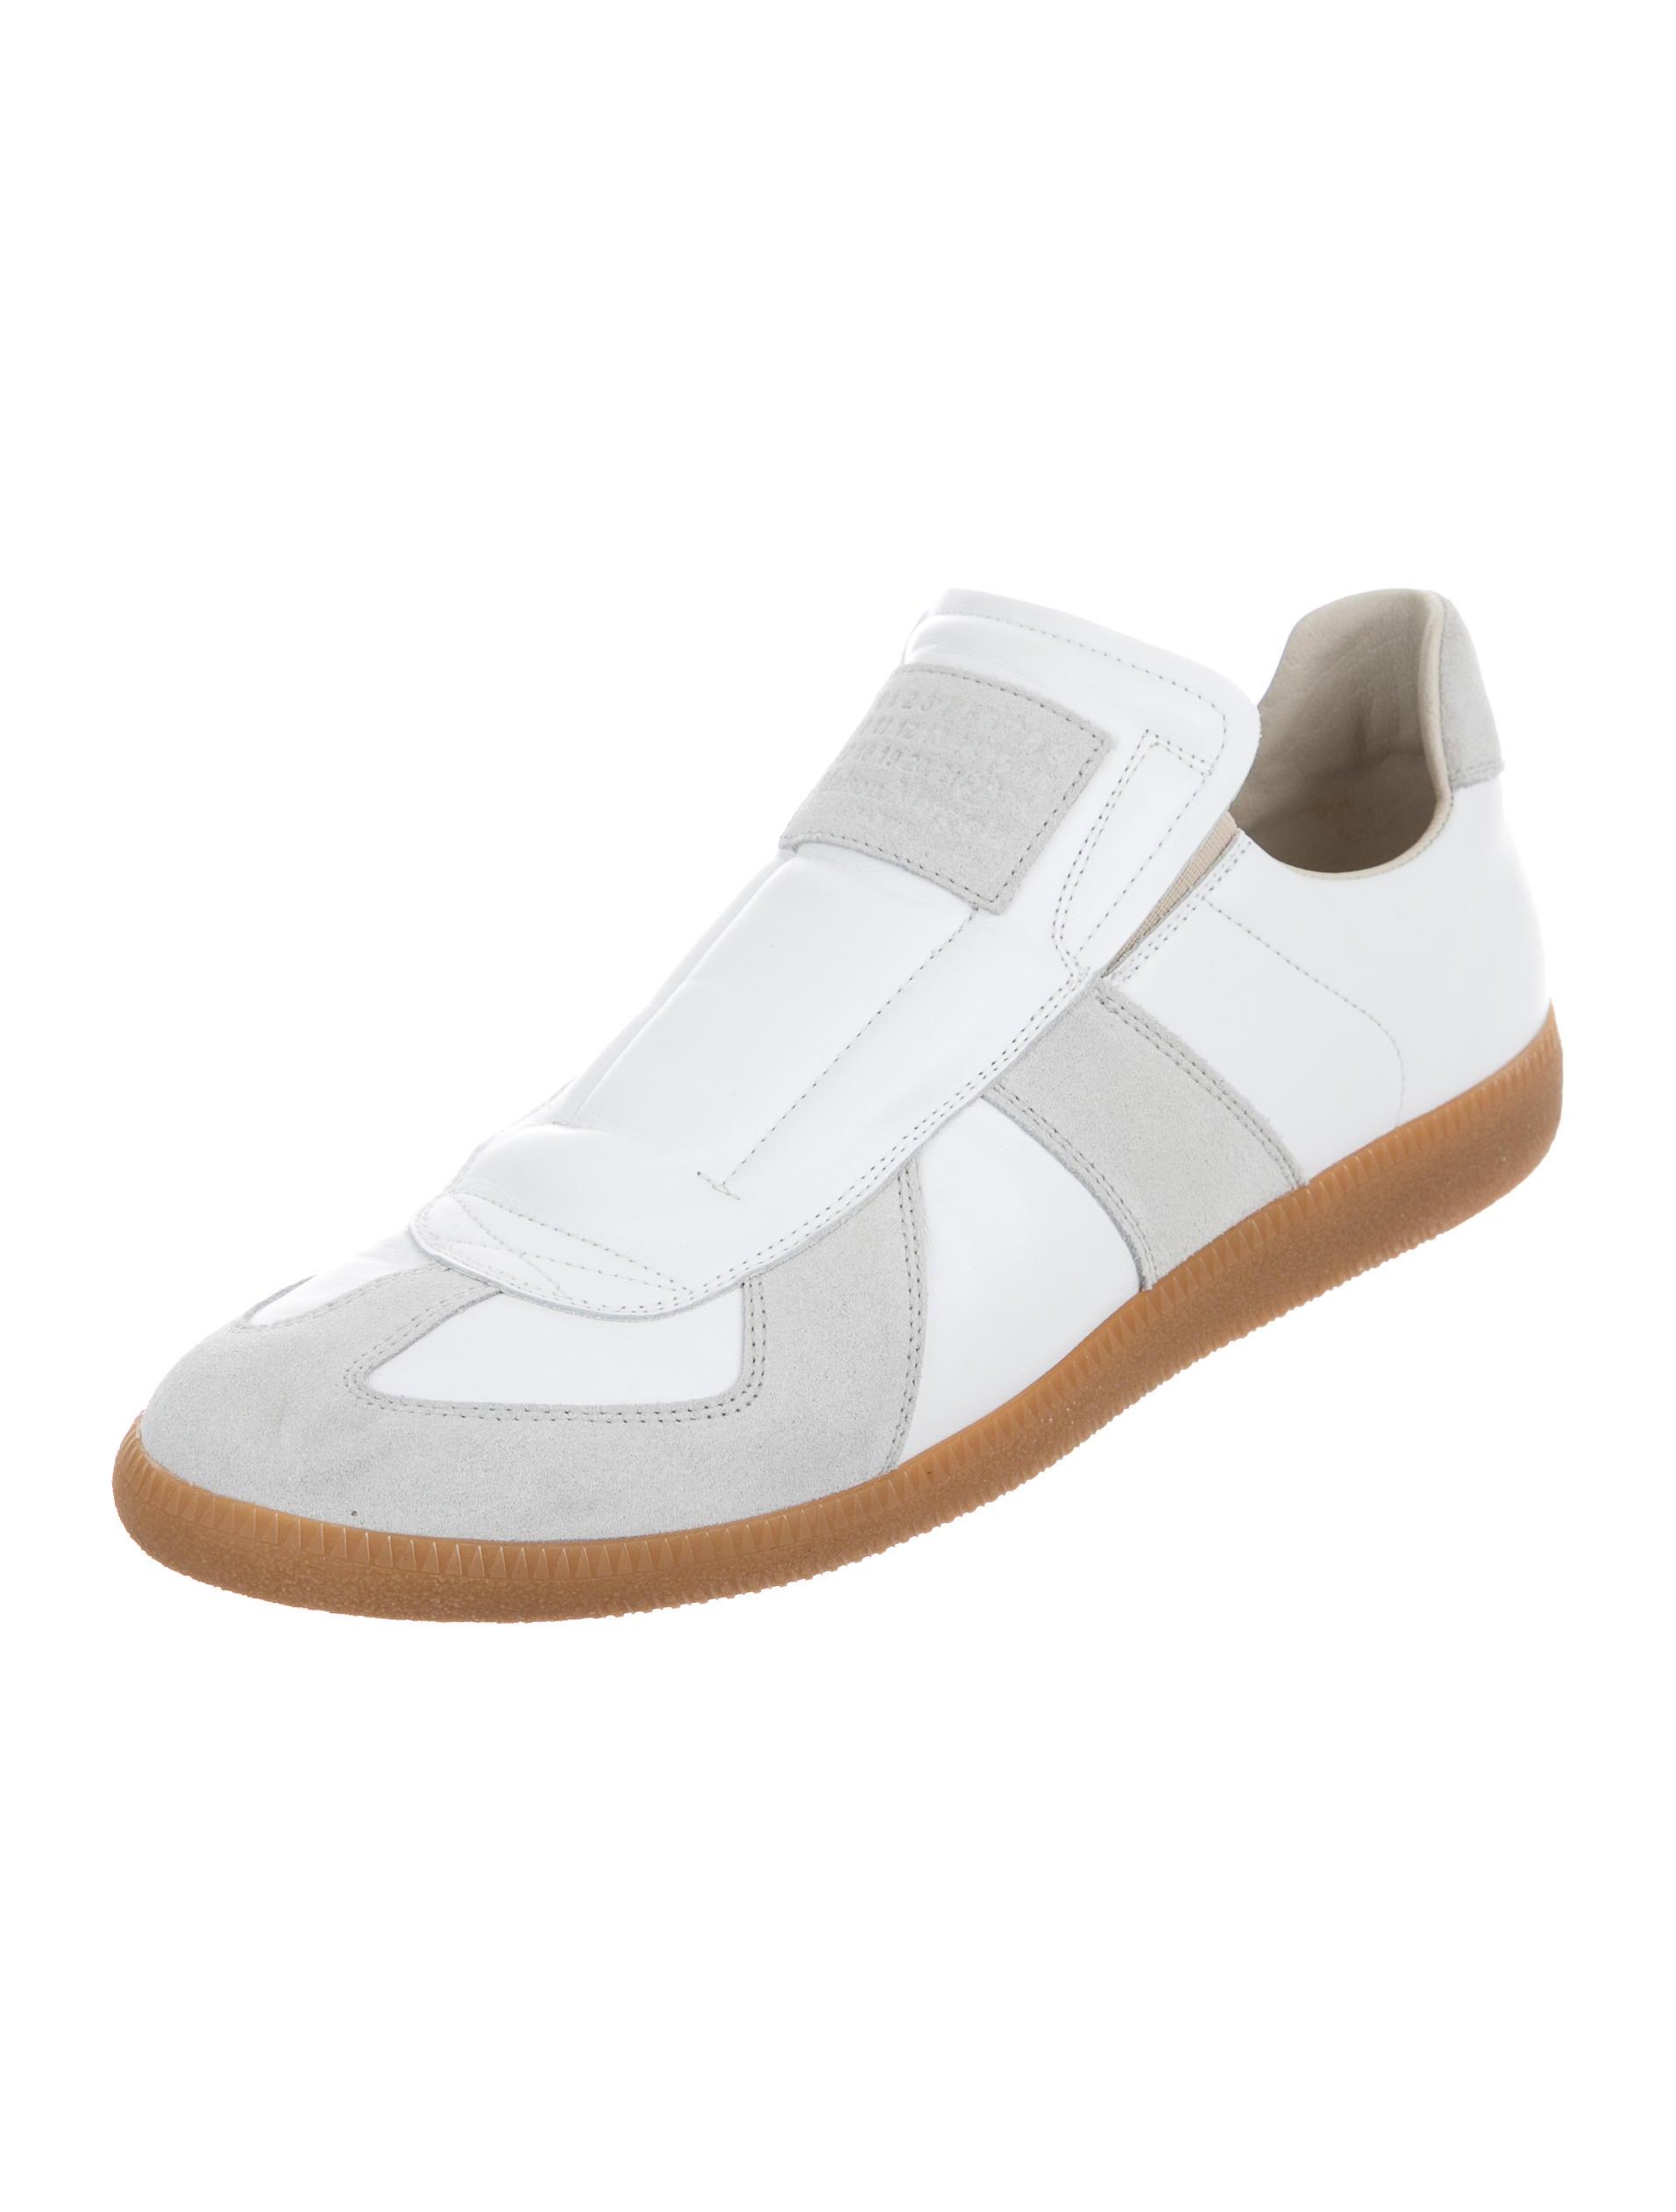 maison margiela replica slip on sneakers shoes mai29765 the realreal. Black Bedroom Furniture Sets. Home Design Ideas